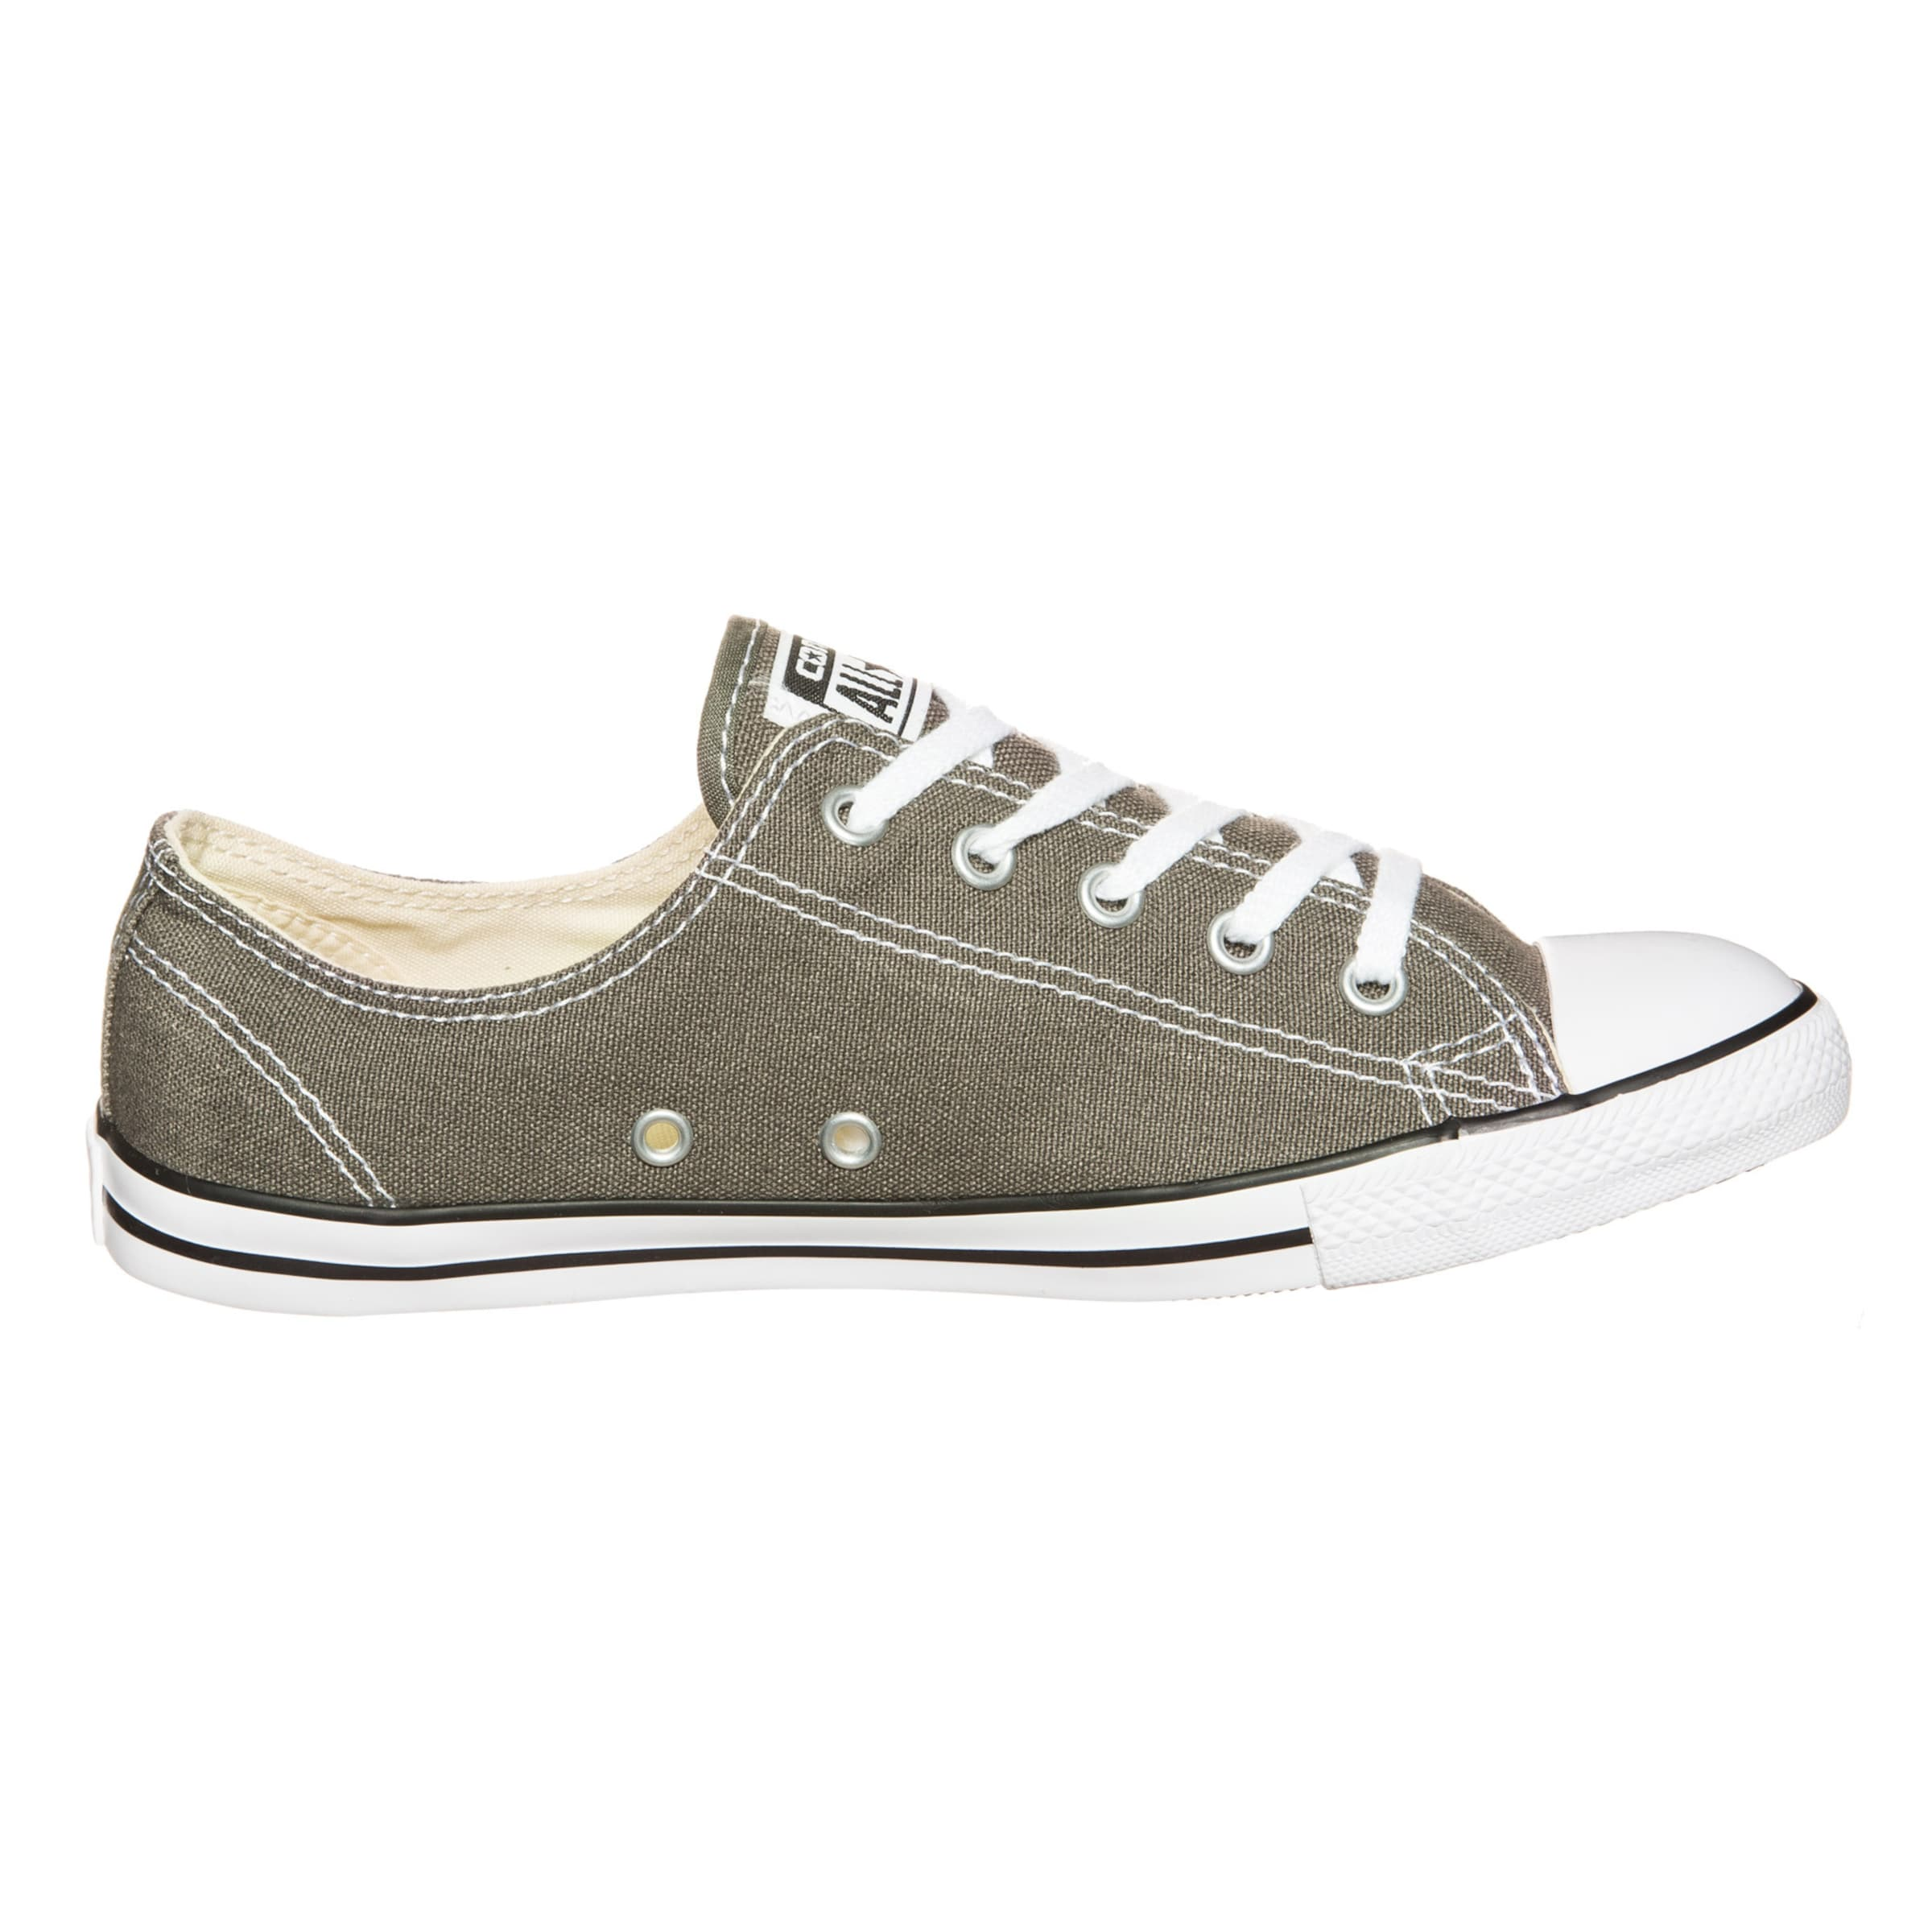 Outlet Rabatt Authentisch CONVERSE Chuck Taylor All Star Dainty OX Sneaker Damen Billig Verkauf Websites fywVb